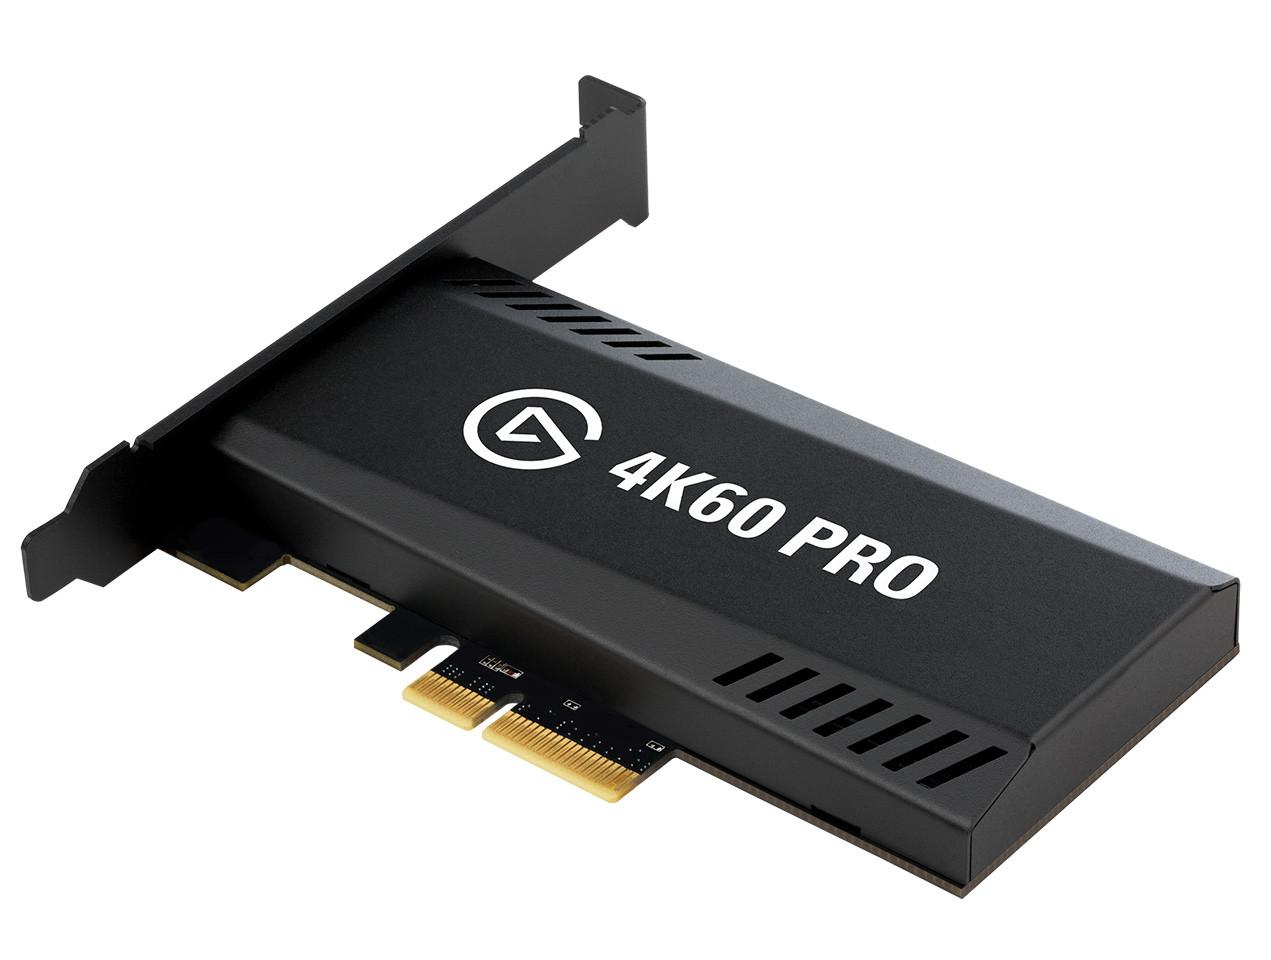 Elgato Launches 4K60 Pro MK 2 Capture Card | TechPowerUp